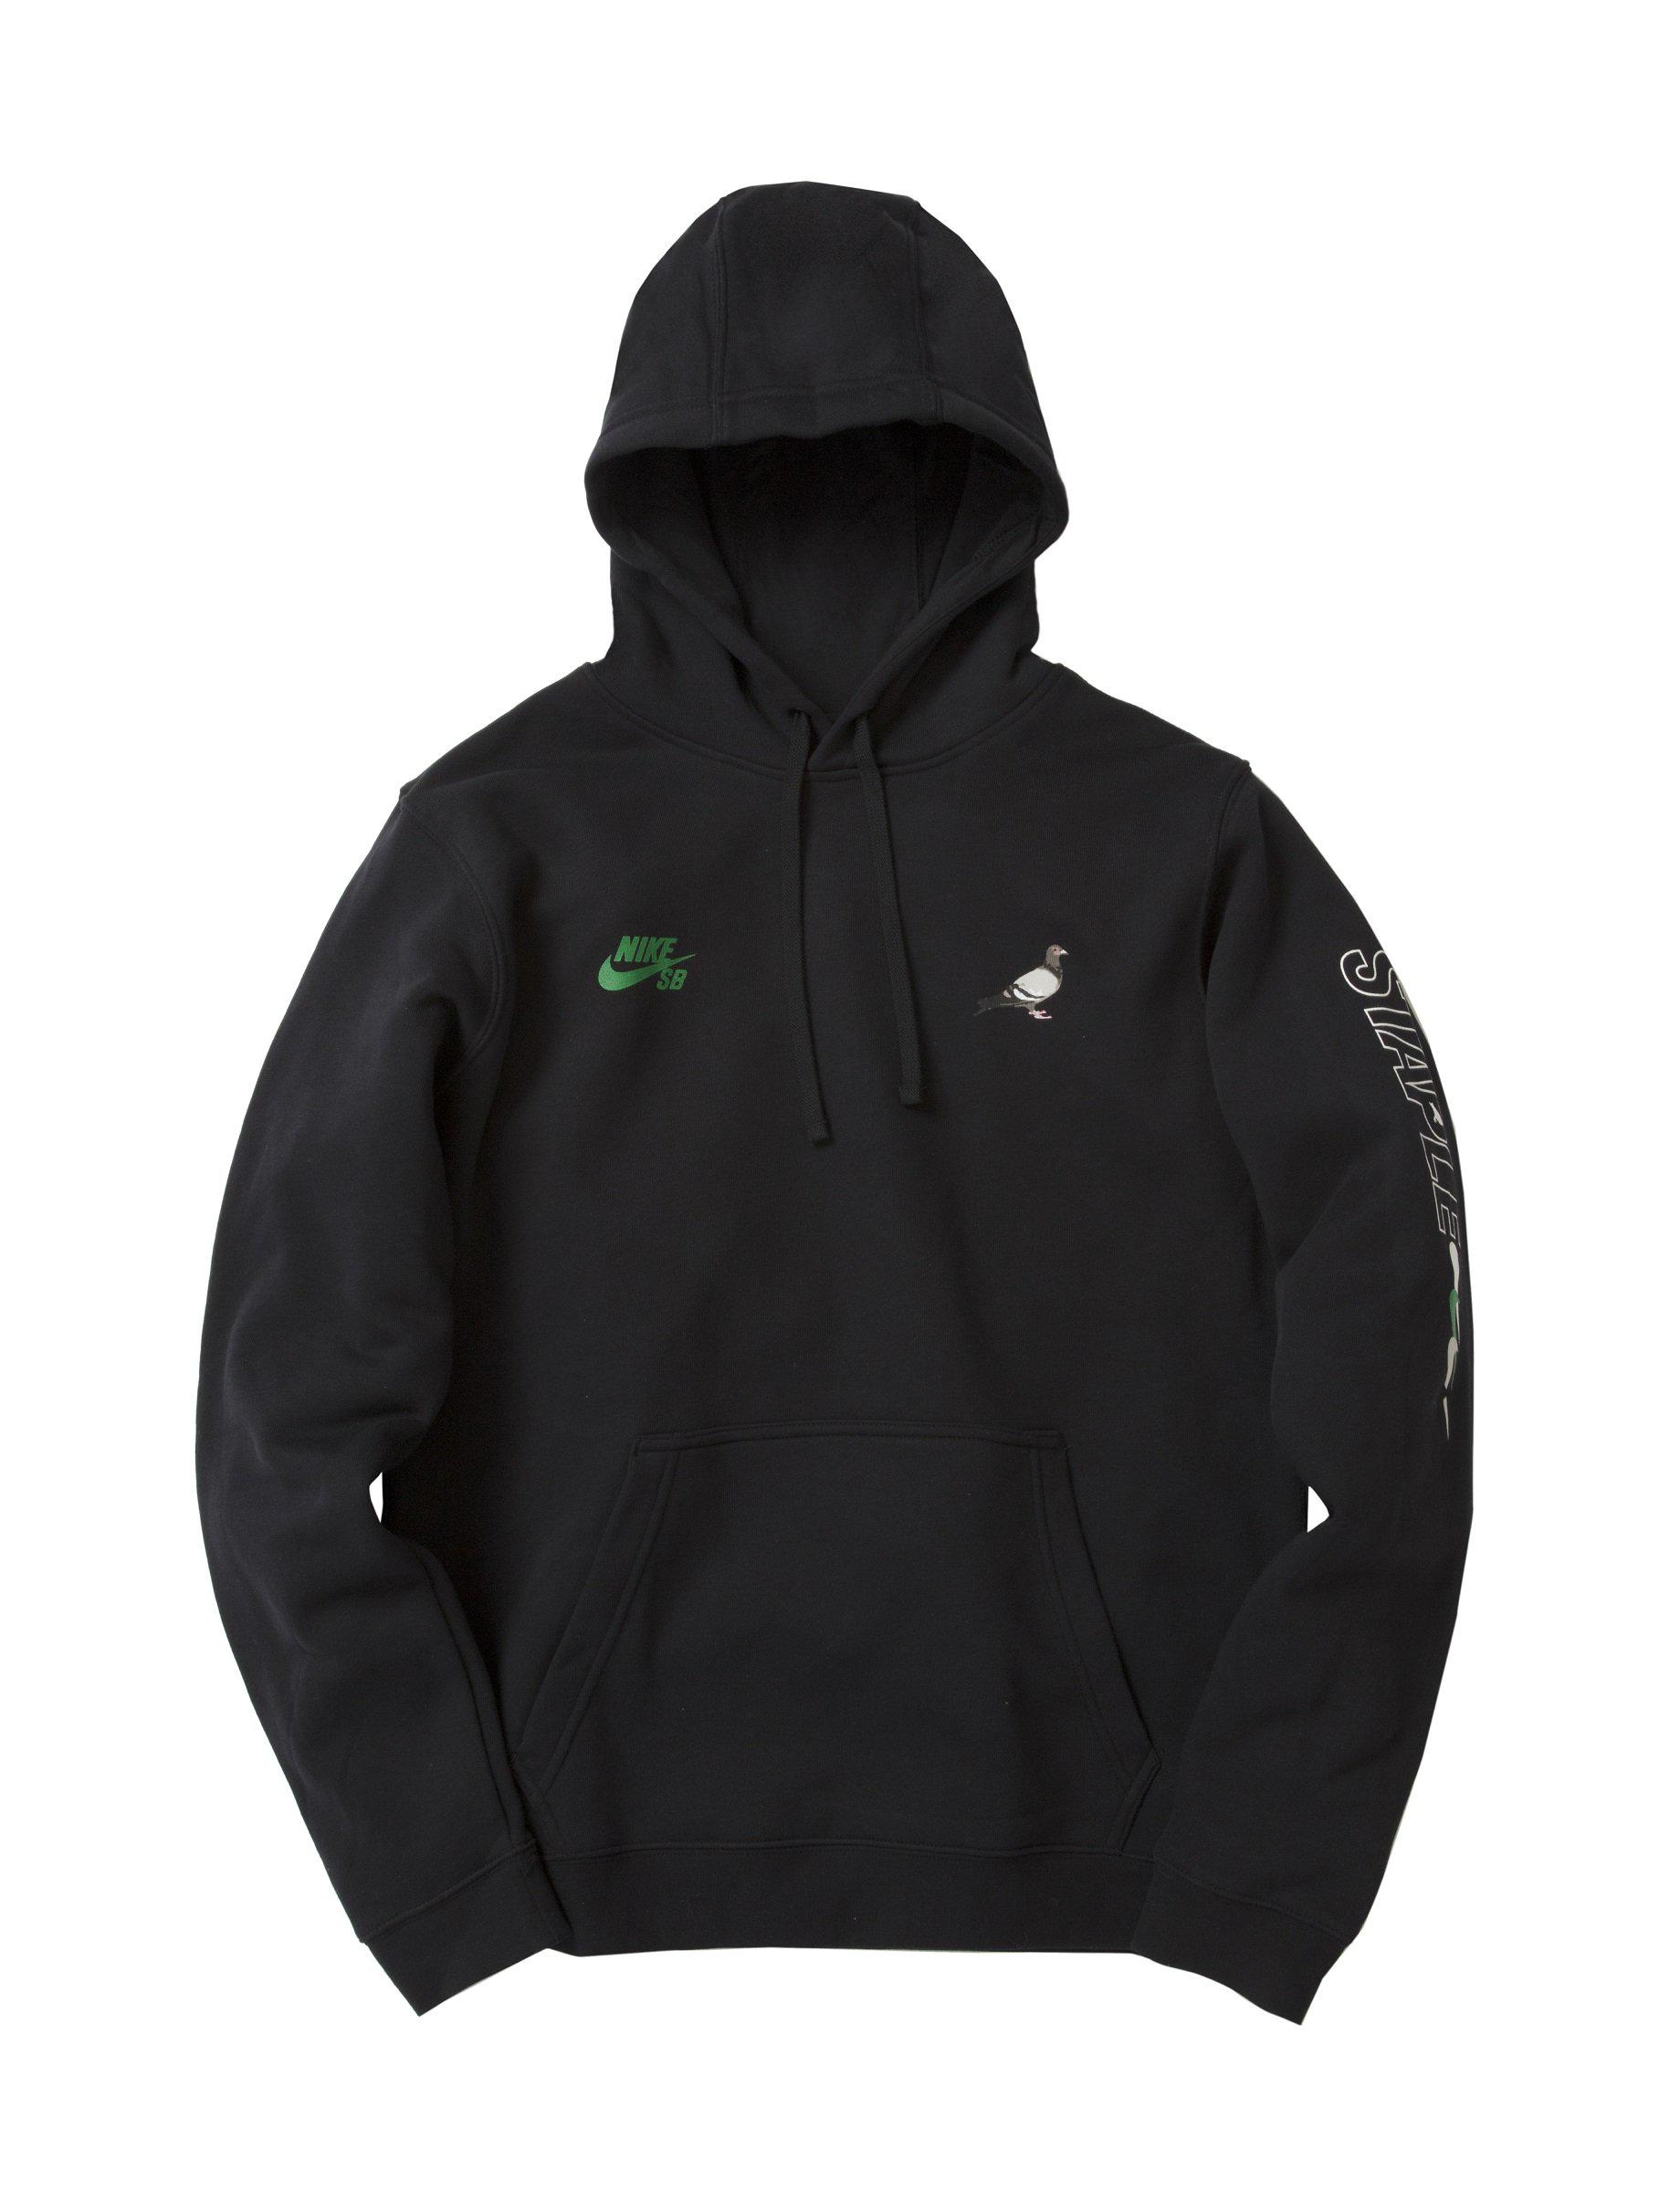 Nike SB x Staple Panda Pigeon Hoodie